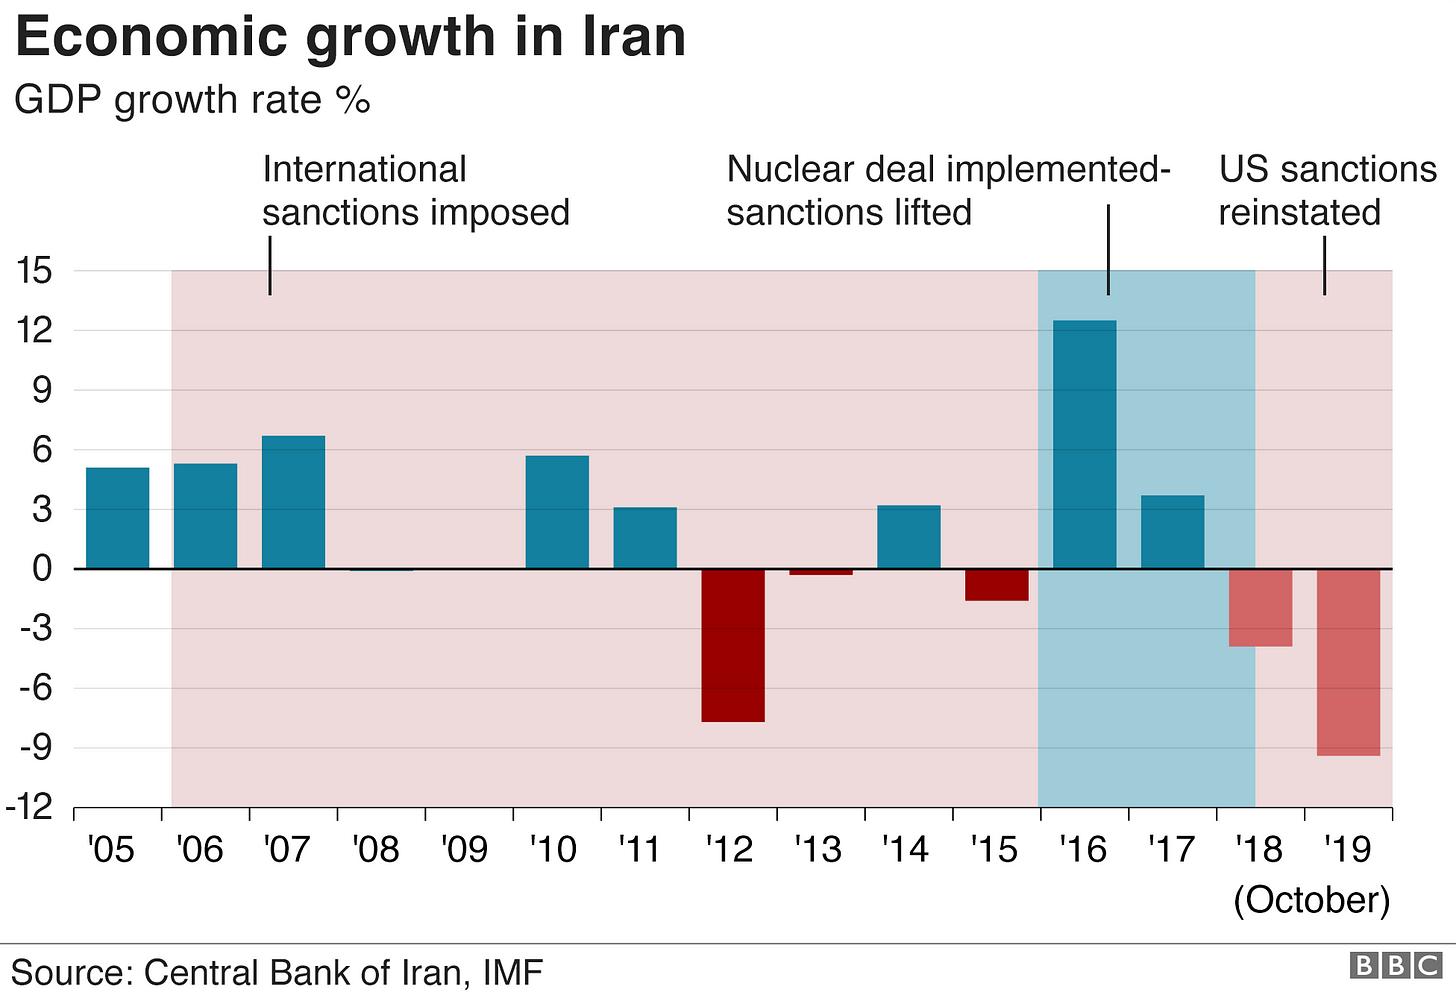 Iran's GDP growth rate (November 2019)